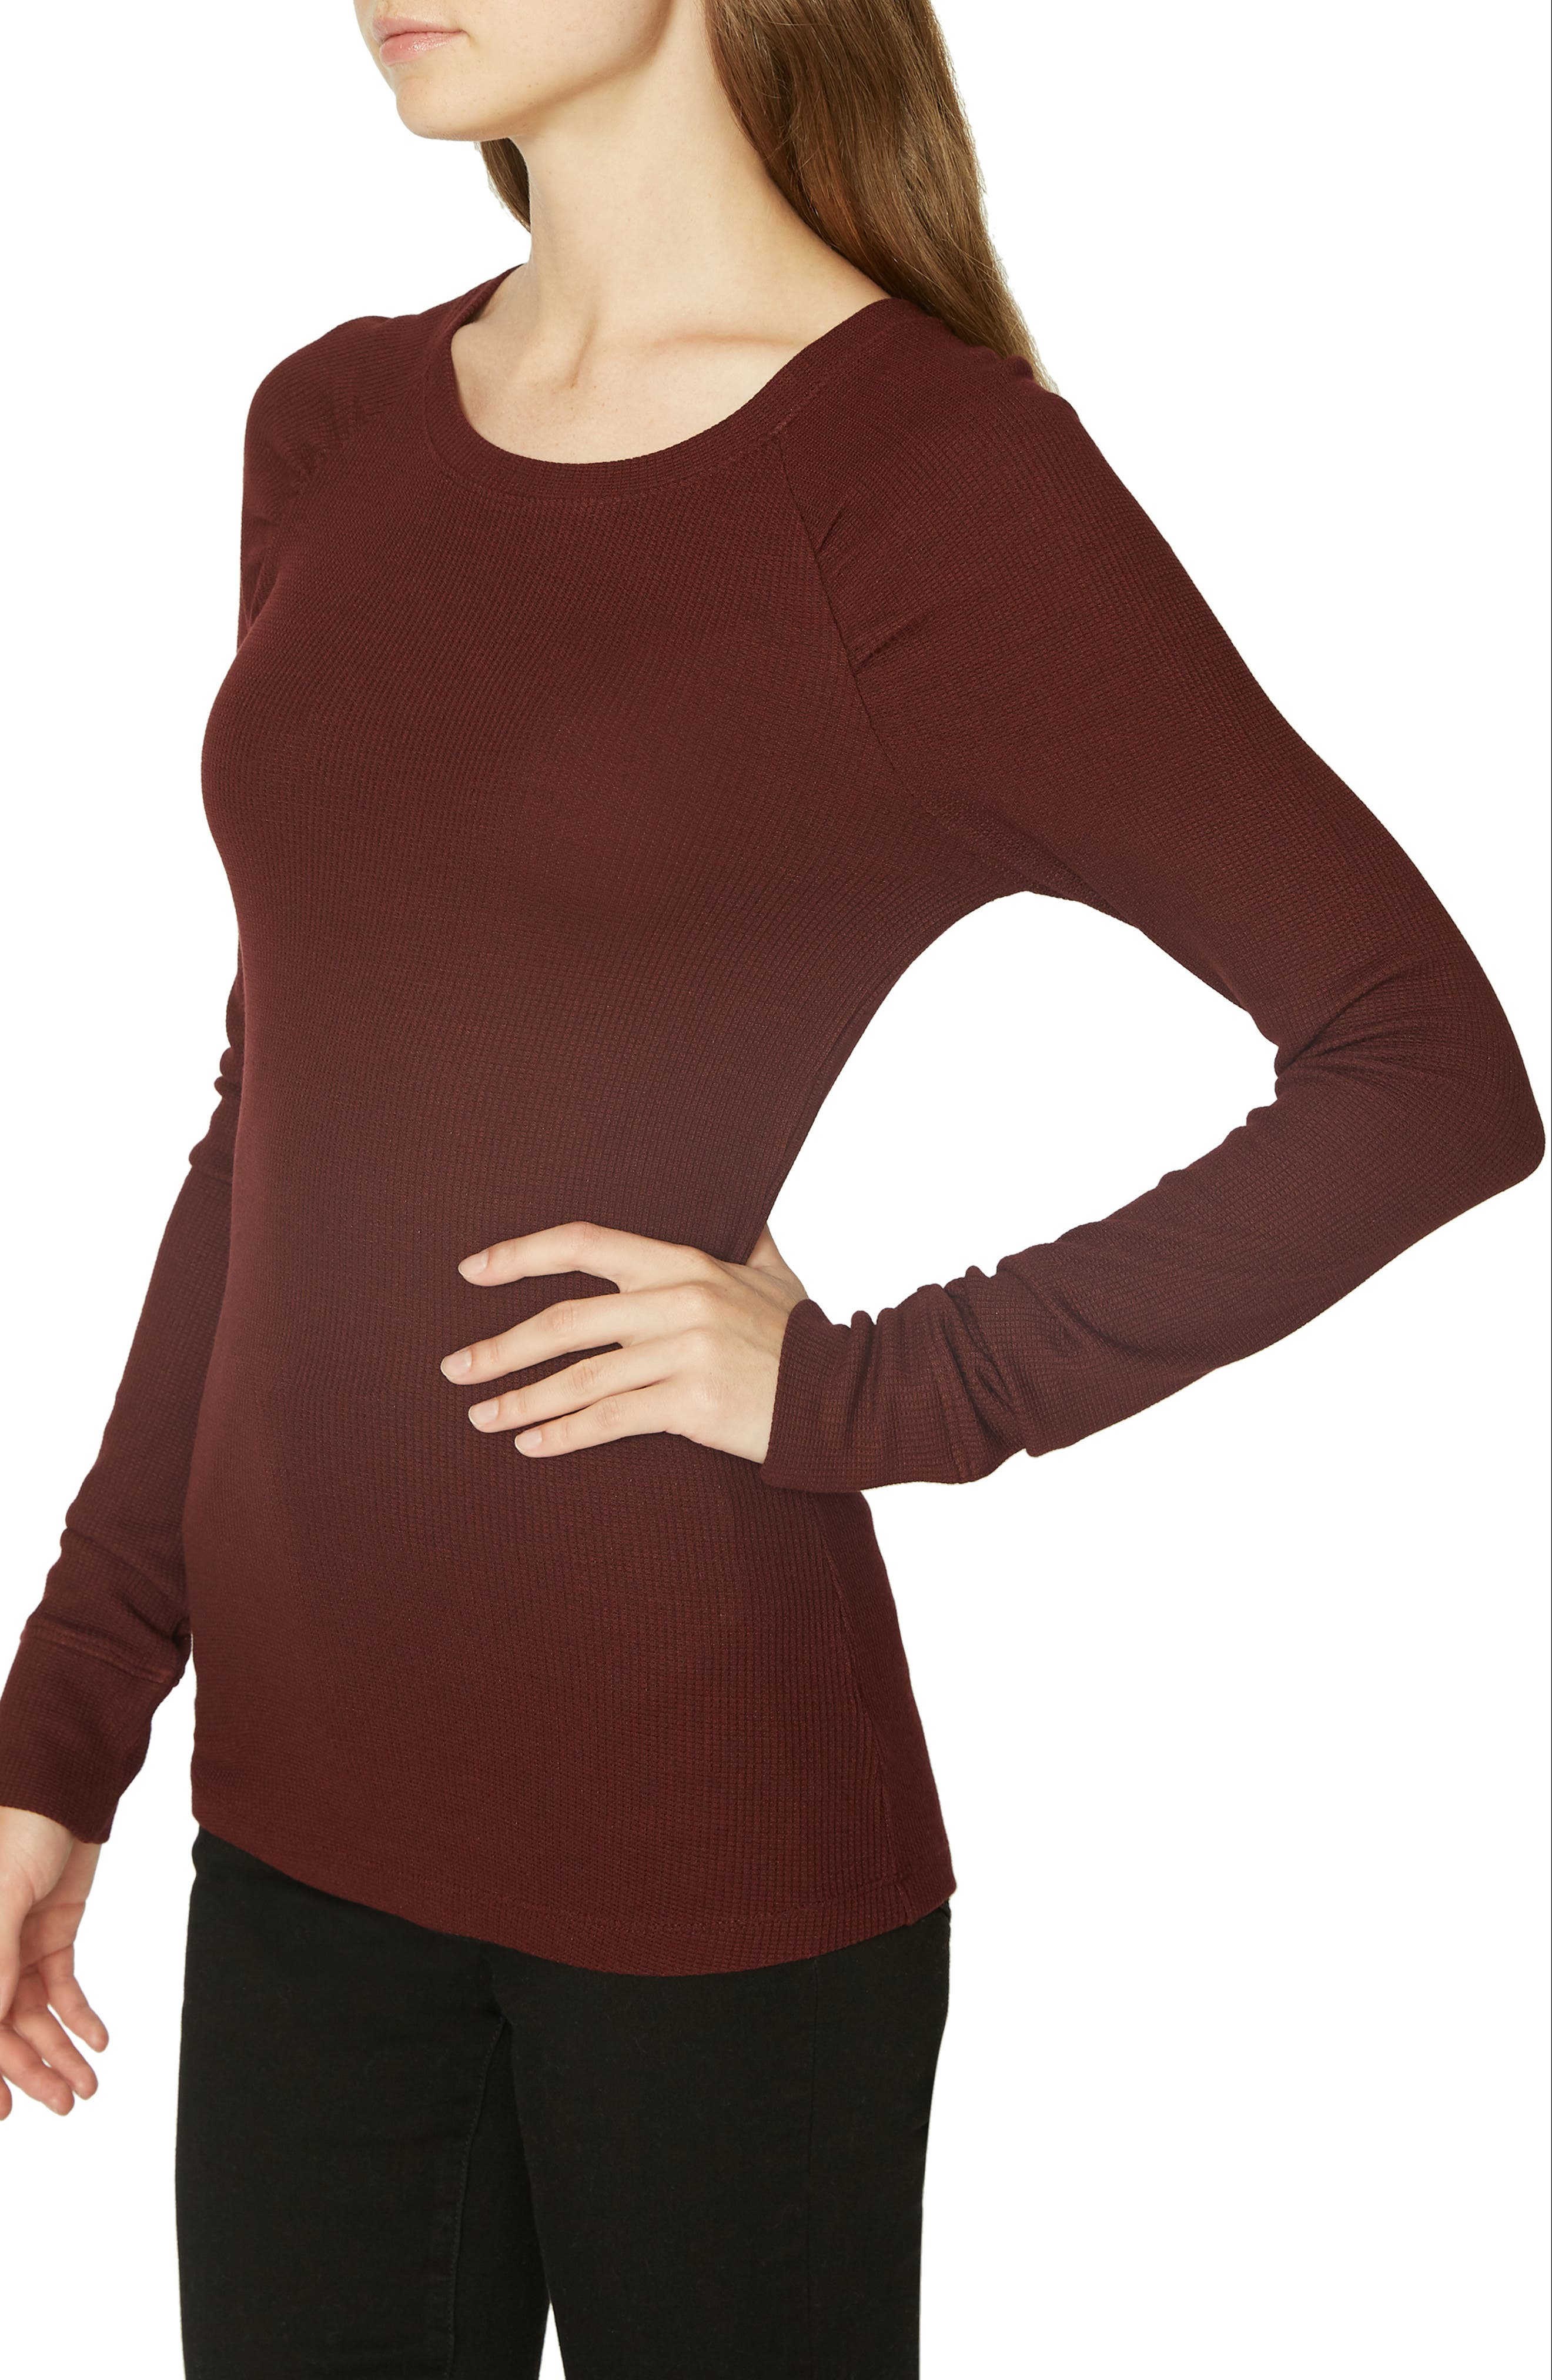 Kenzie Thermal Pullover,                             Alternate thumbnail 3, color,                             SCARLET